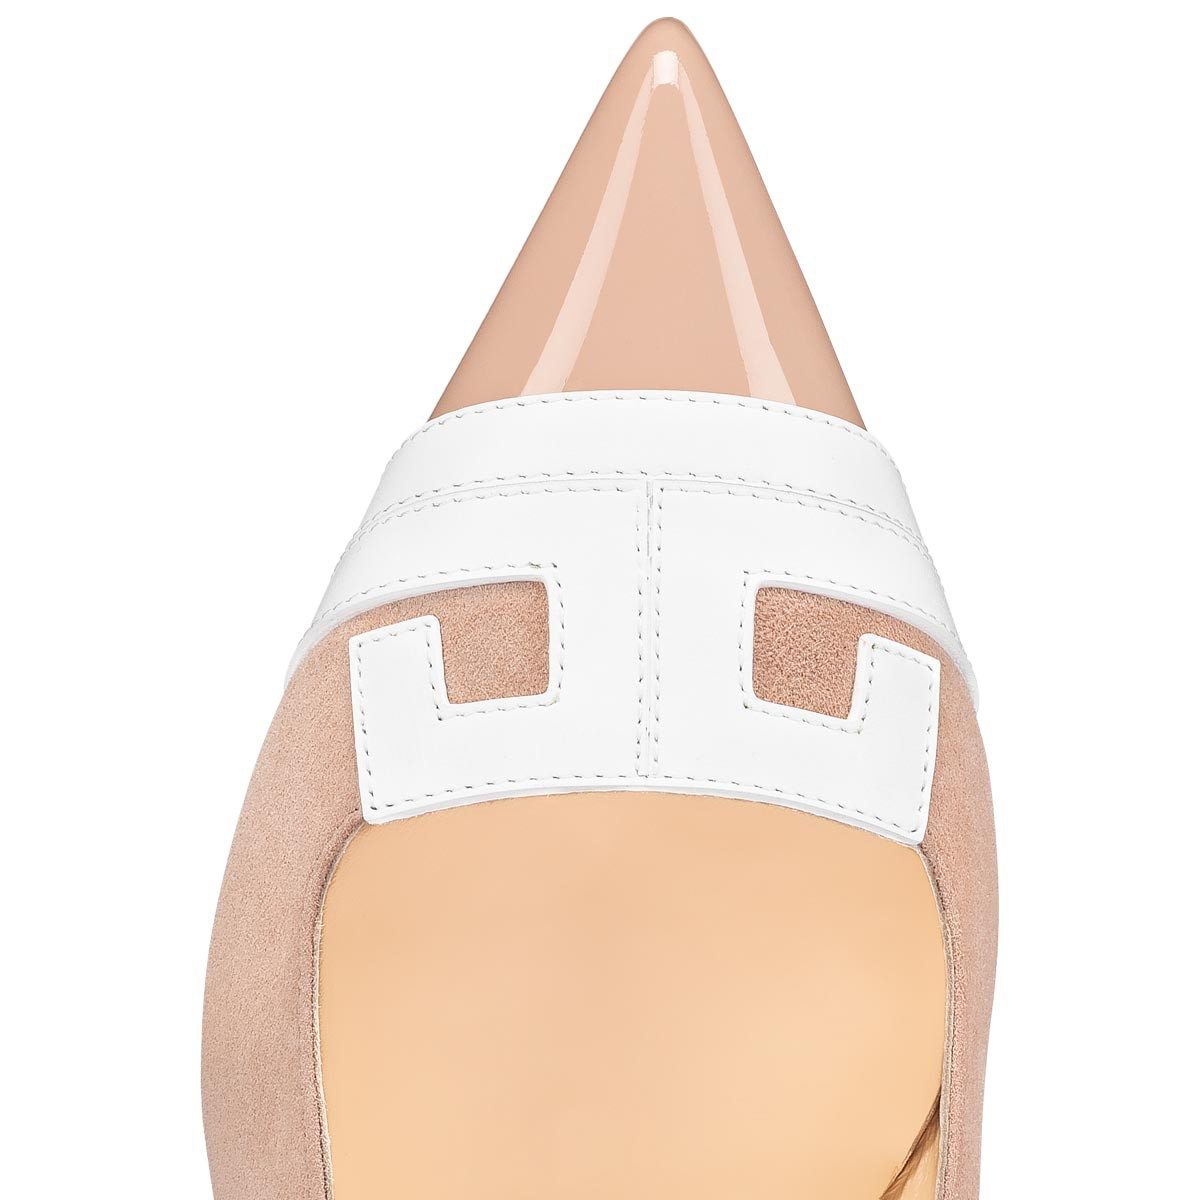 Shoes - Hao Pump - Christian Louboutin